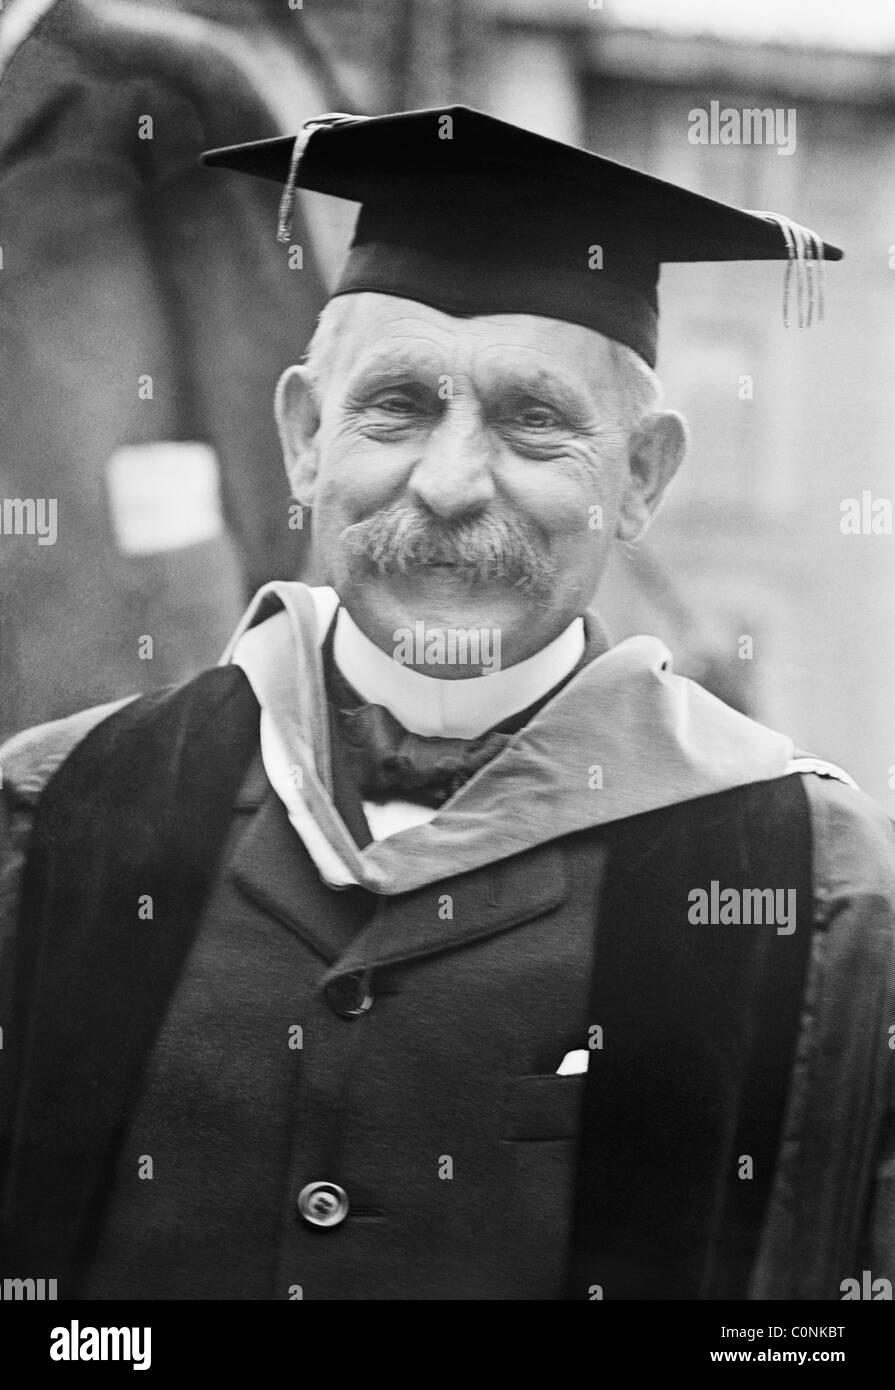 Paul Henri Benjamin Baluet d'Estournelles, Baron de Constant de Rebecque (1852 - 1924) - co-winner of Nobel - Stock Image